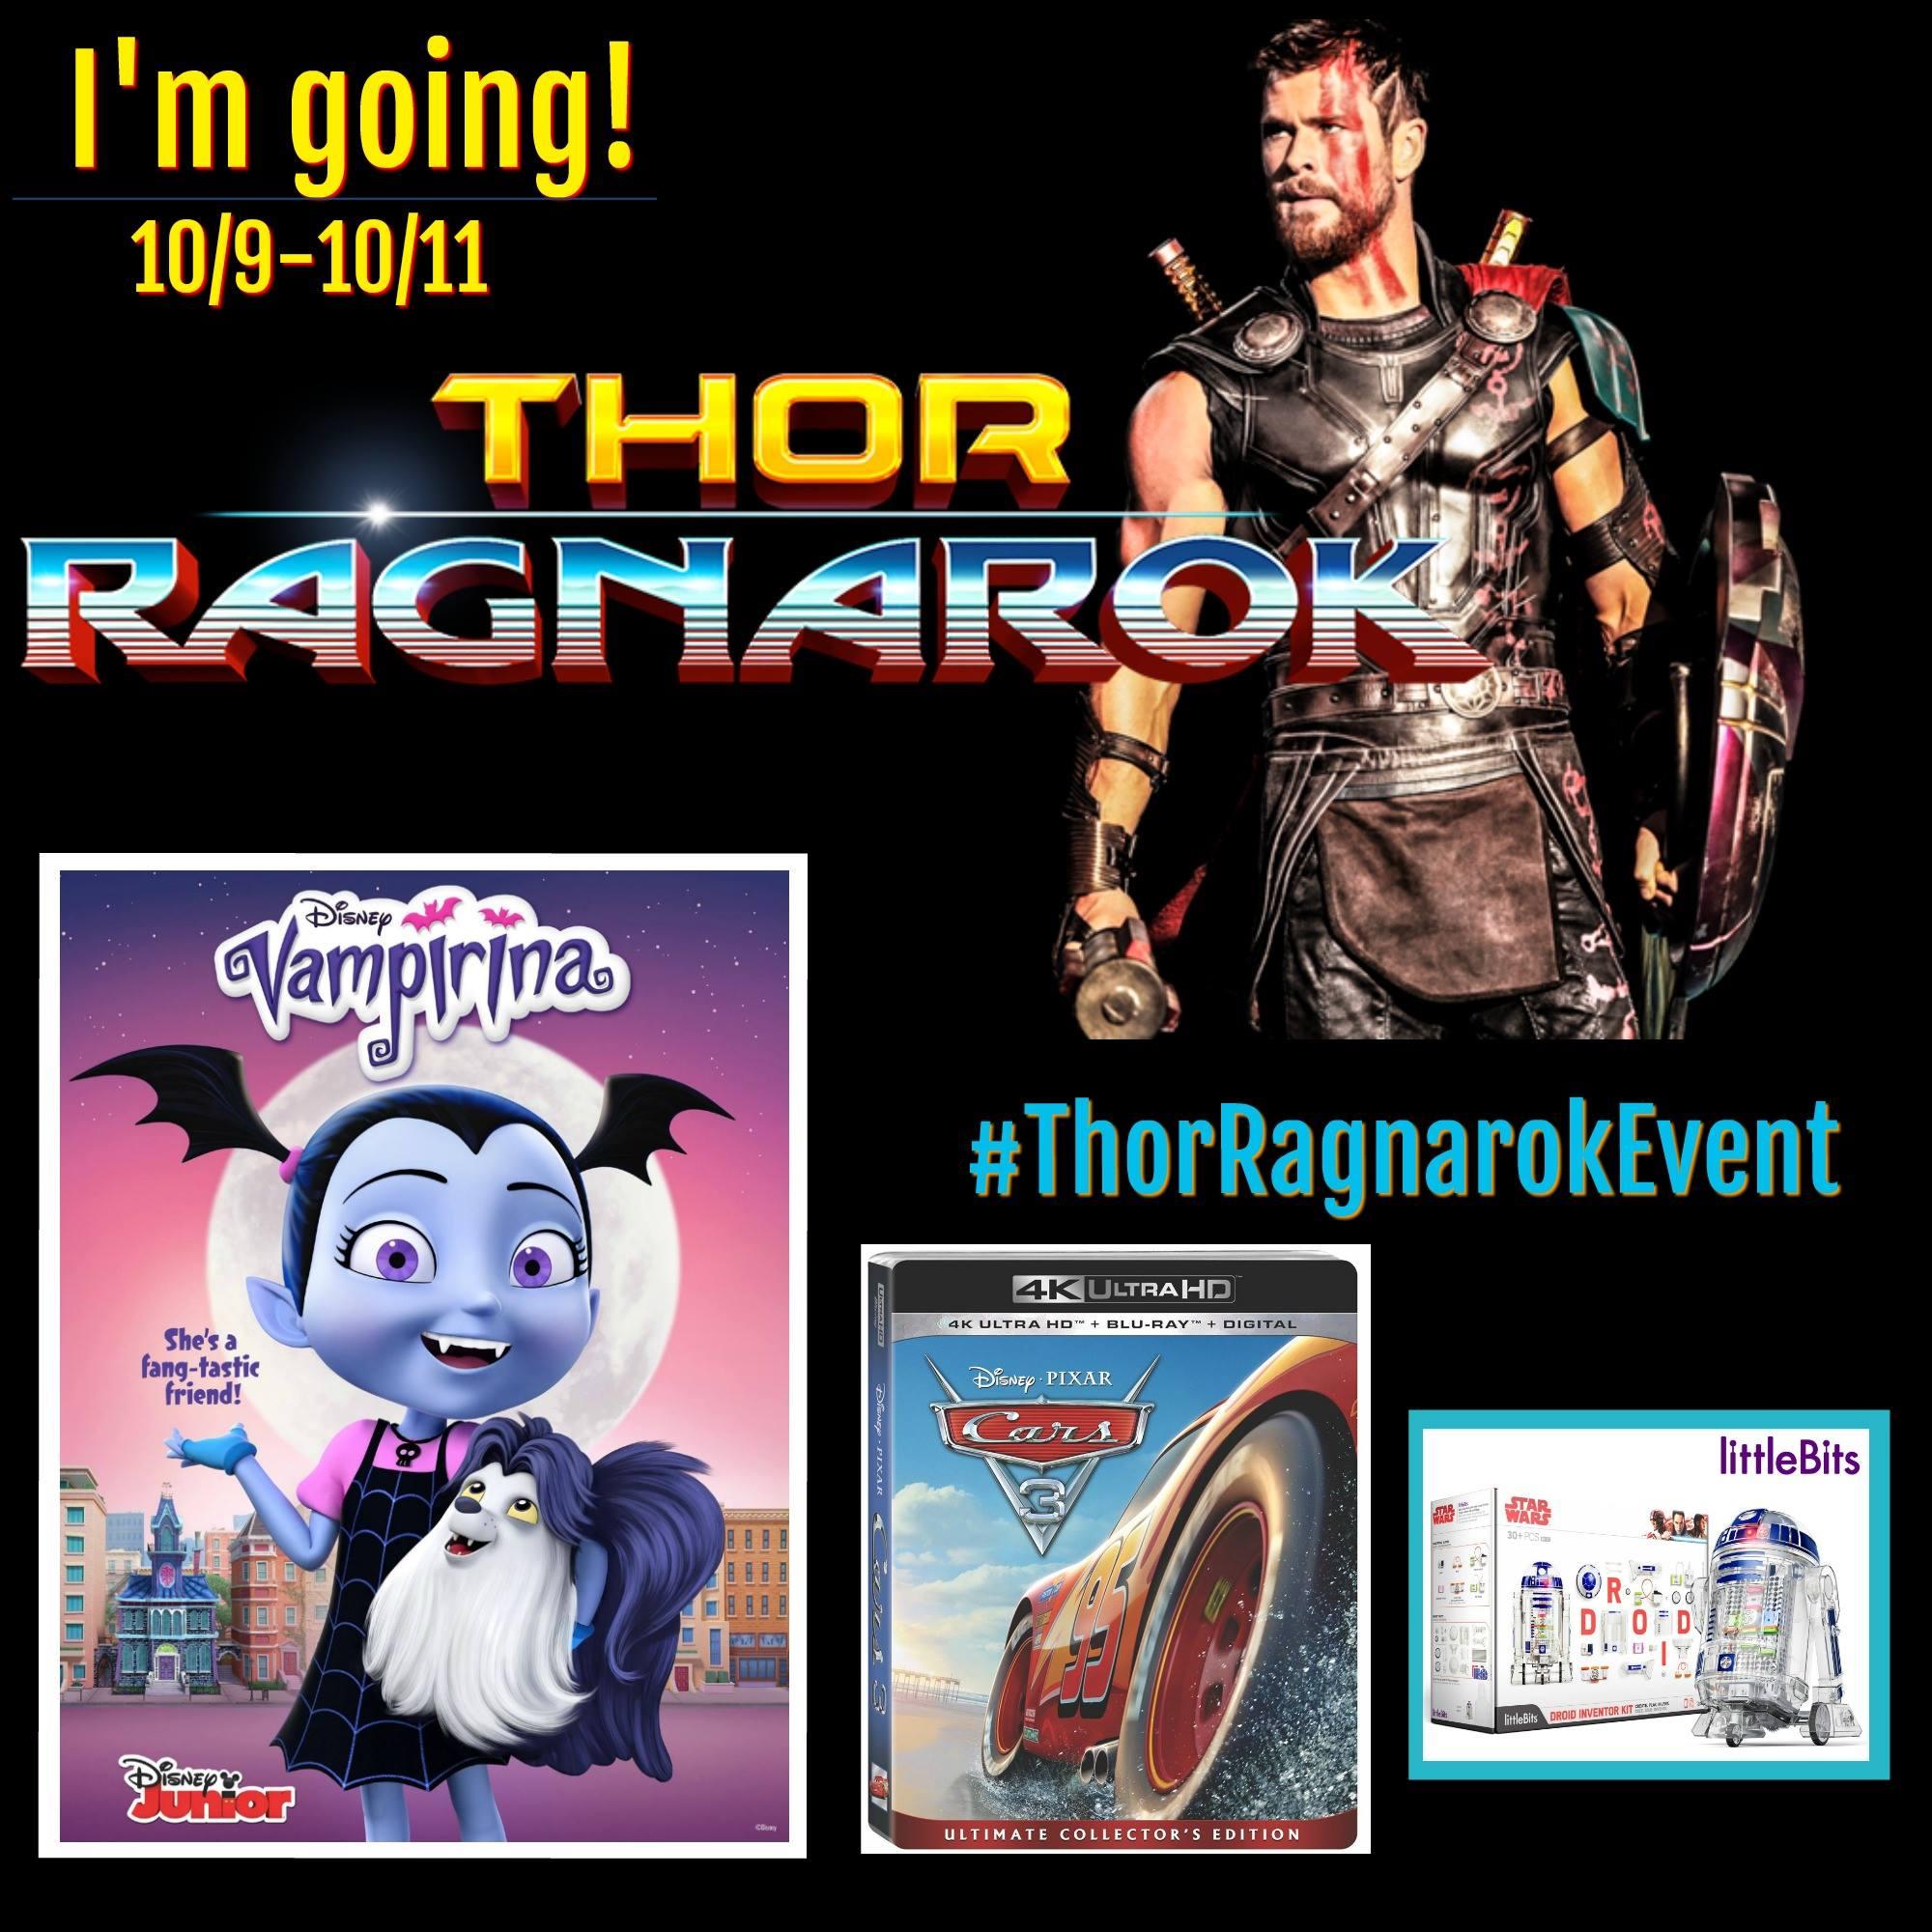 Attending #ThorRagnarokEvent